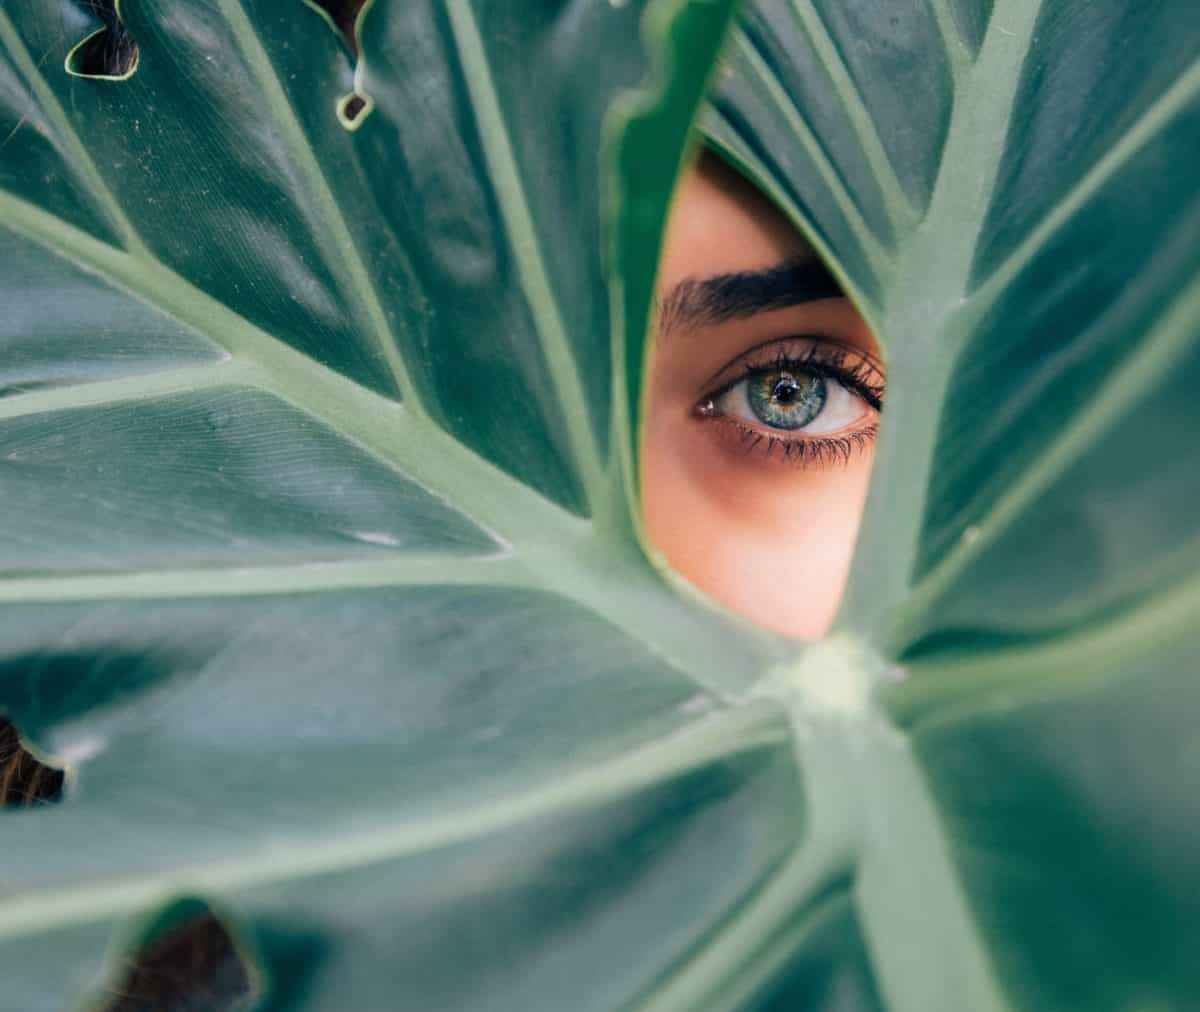 Woman's one eye peeking through large green leaf